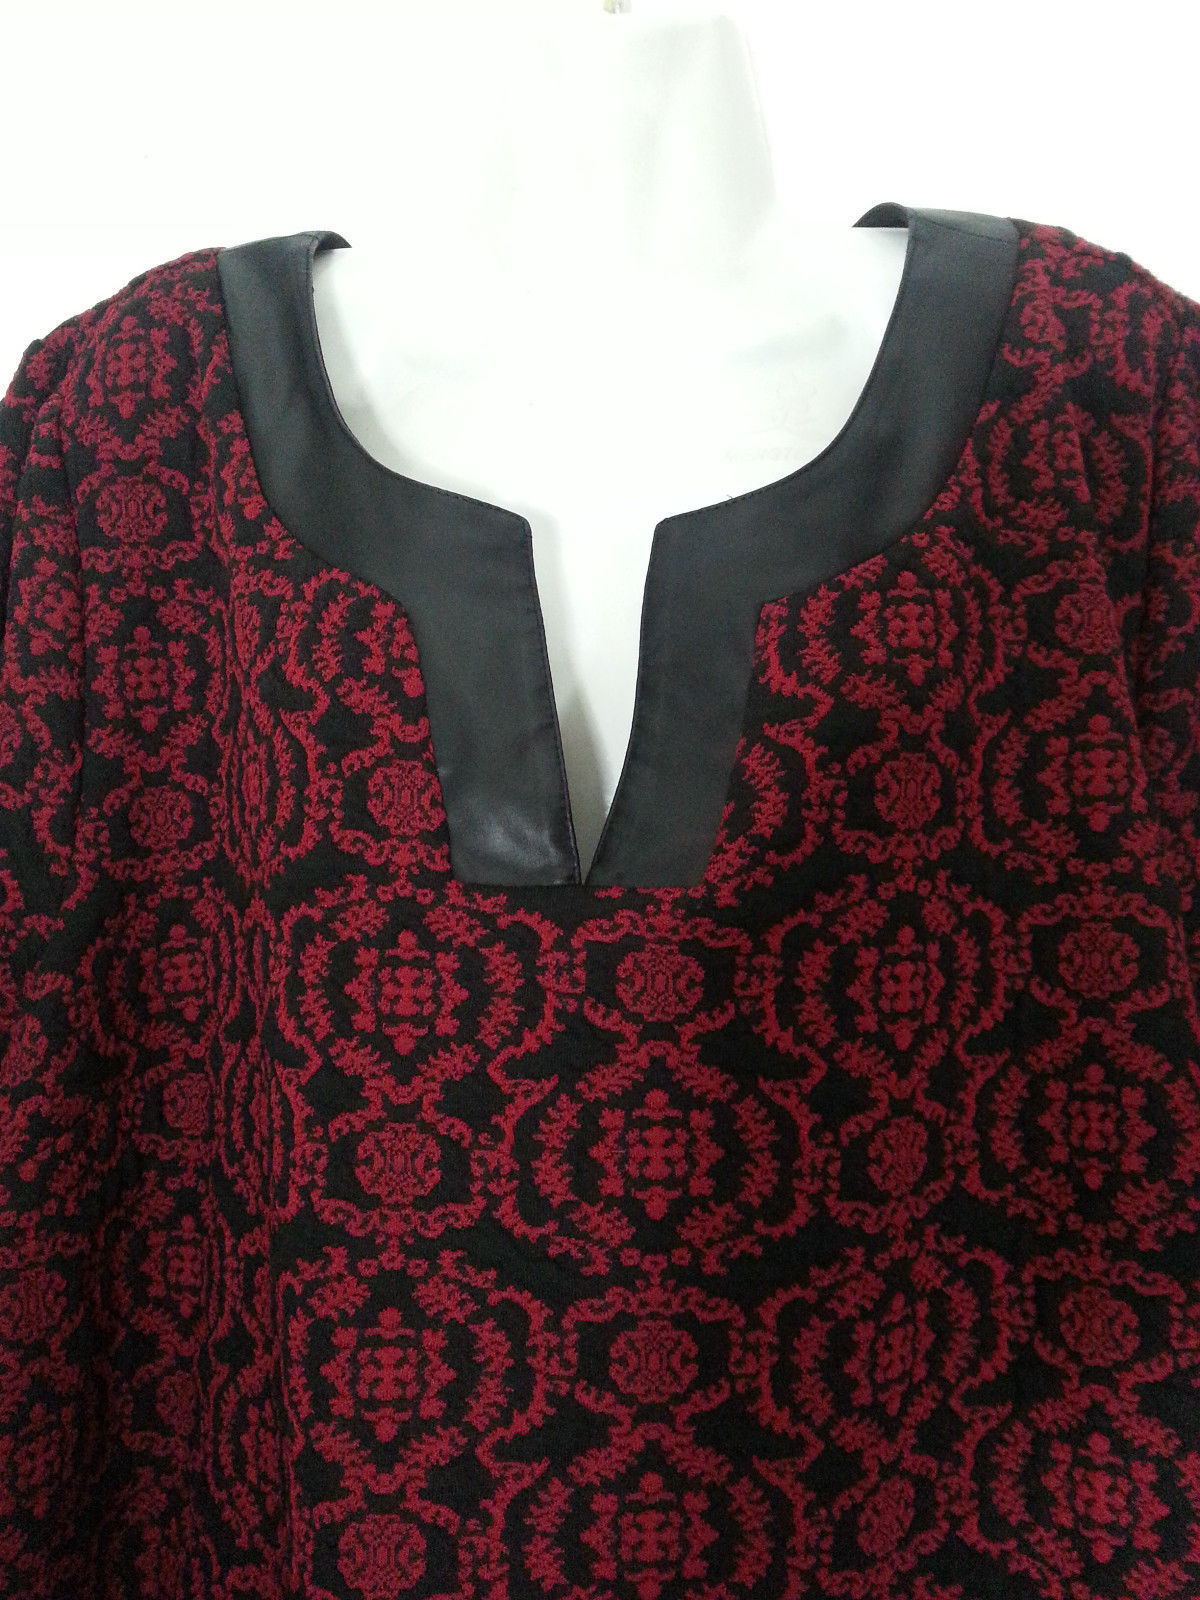 201892abb2 CATHERINES BLACK AND RED DRESS NEW 22-24 2X NWT PLUS SIZE DRESS W